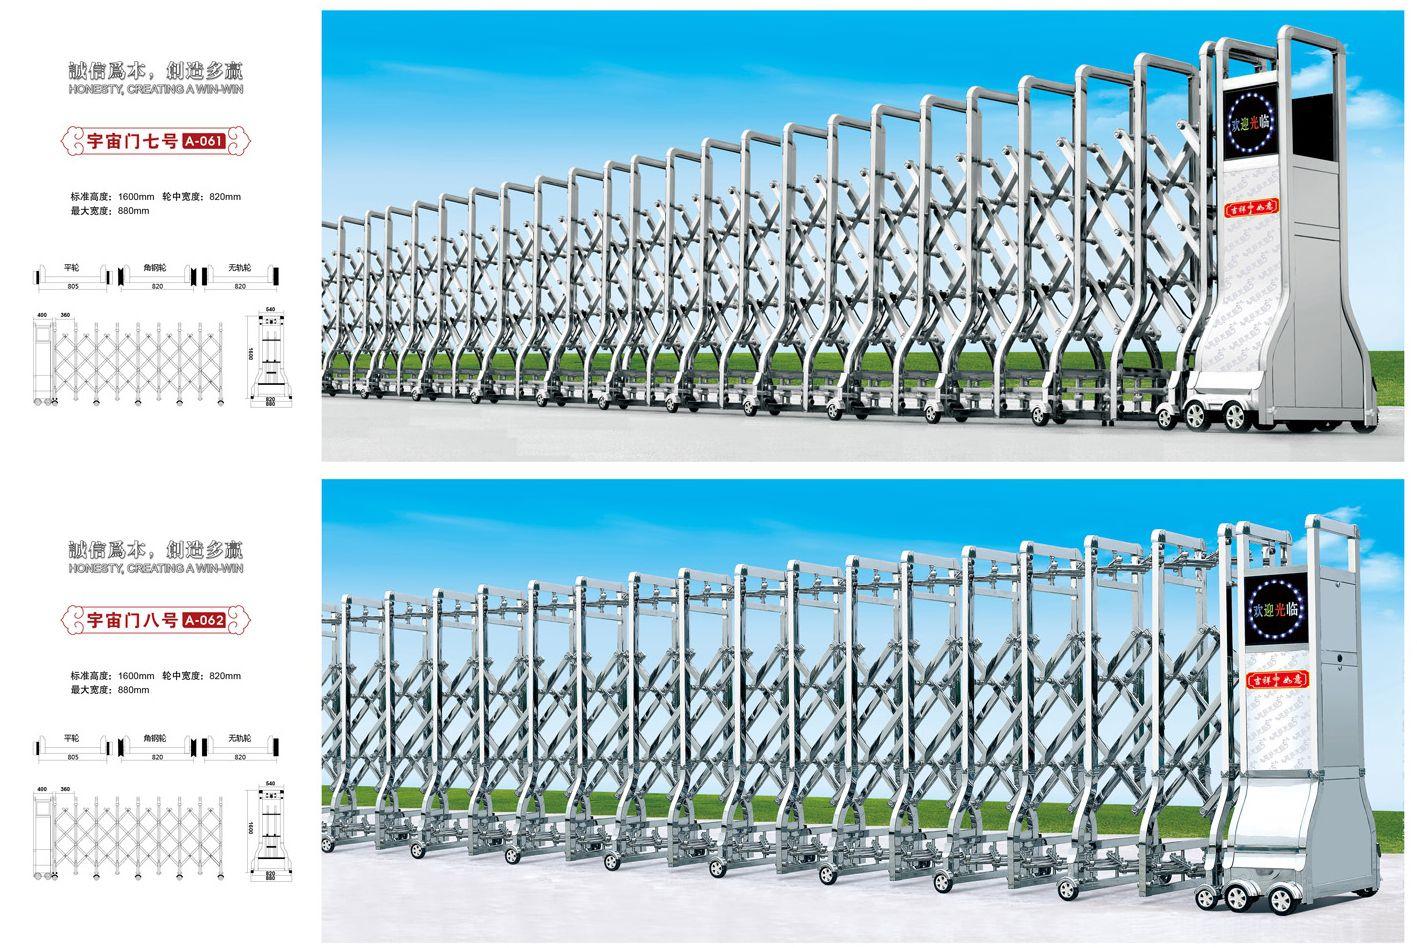 yxsddm021桥头工业区电动门